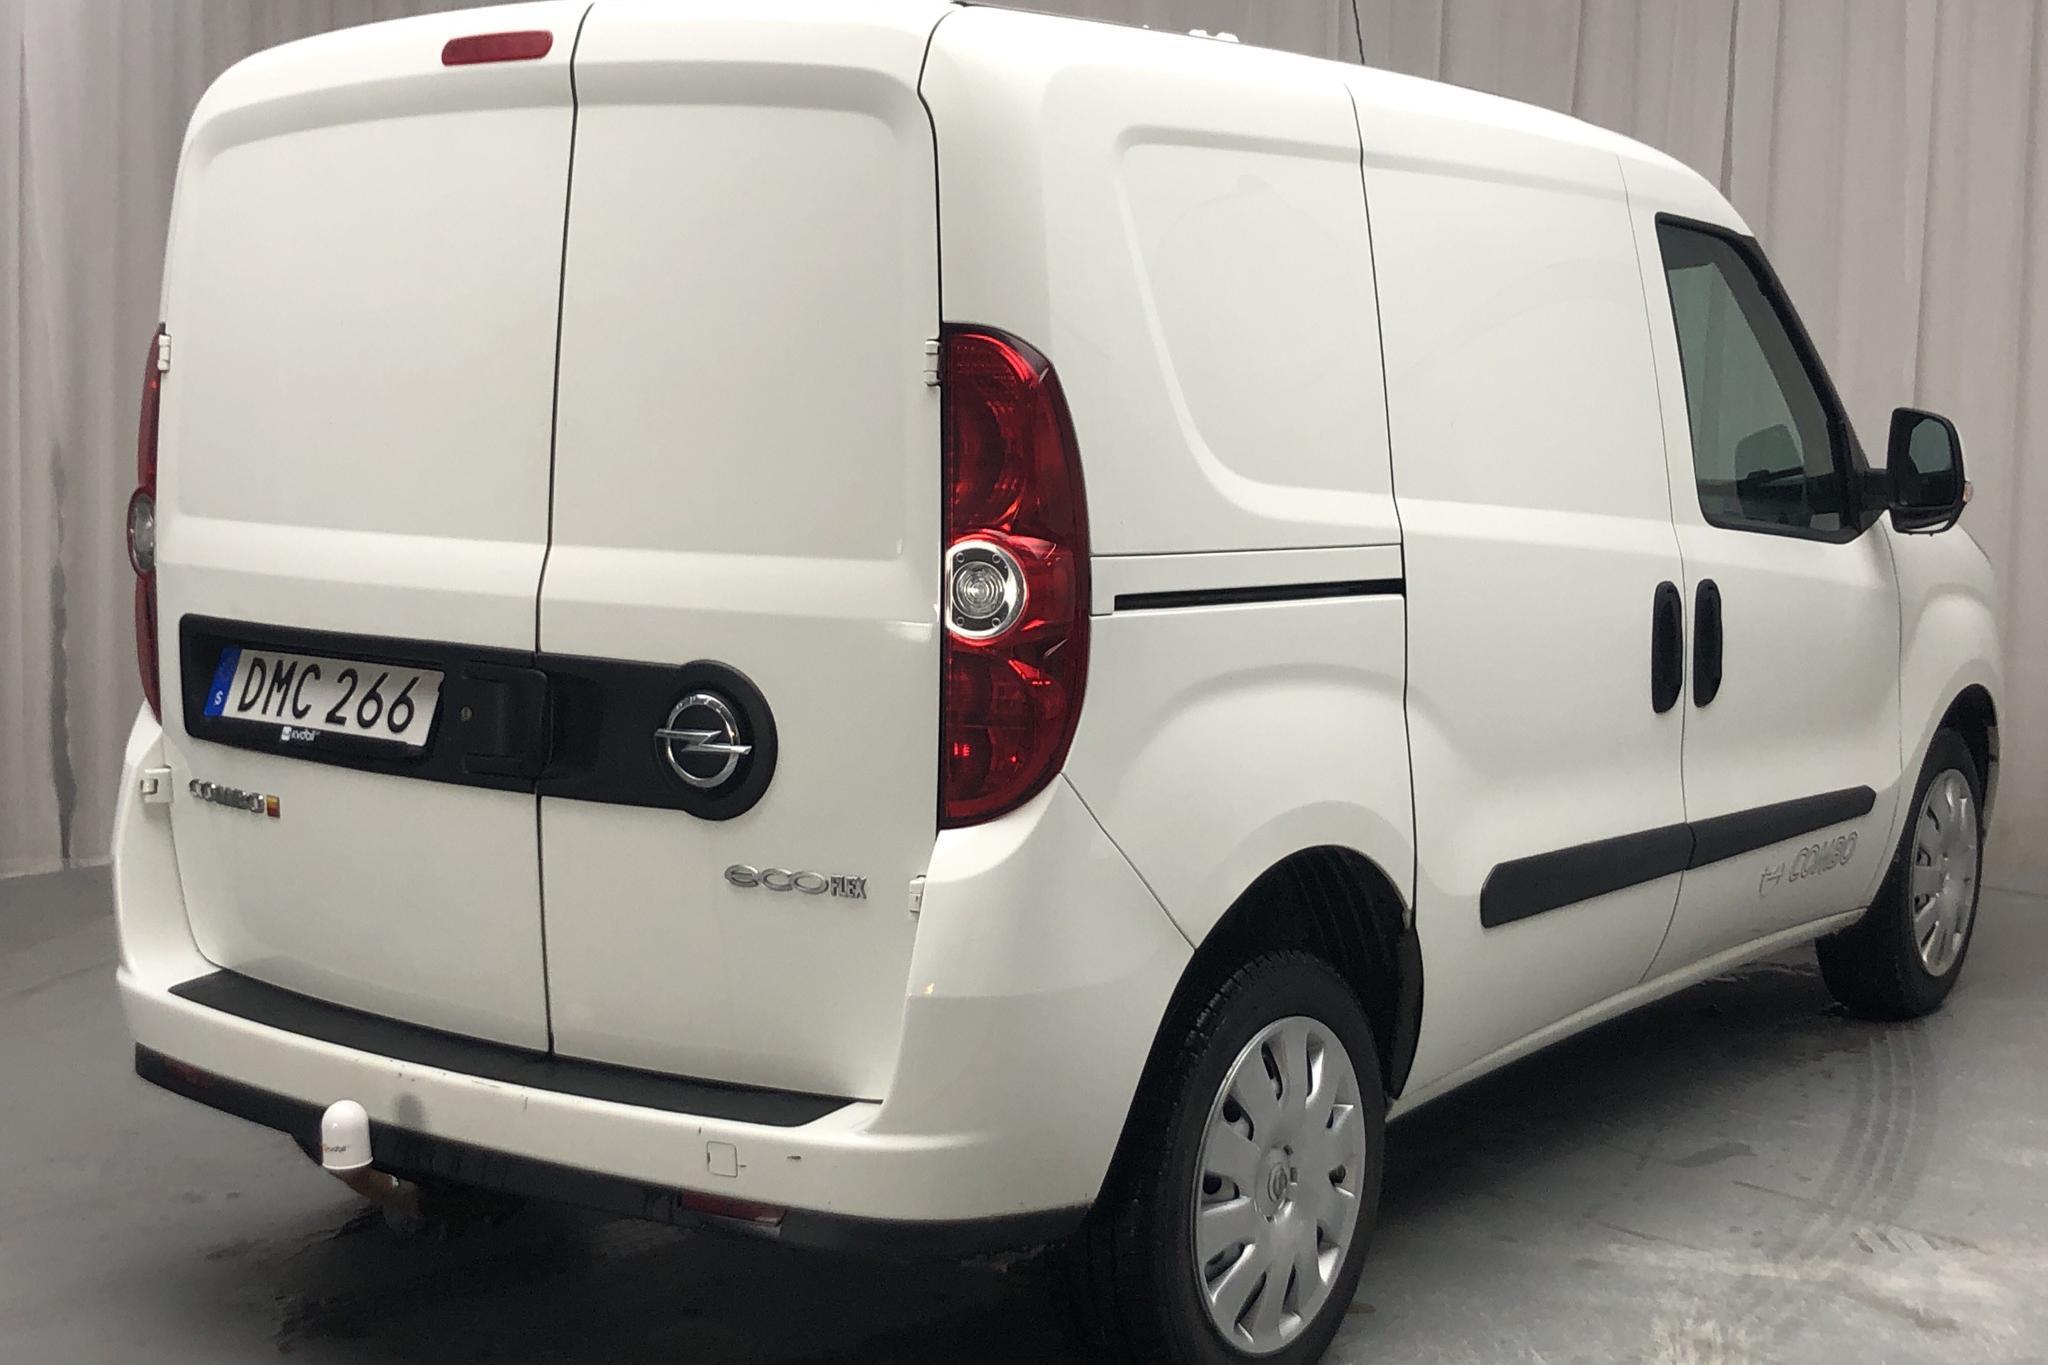 Opel Combo 1.3 CDTI Skåp (90hk) - 7 121 mil - Manuell - vit - 2015